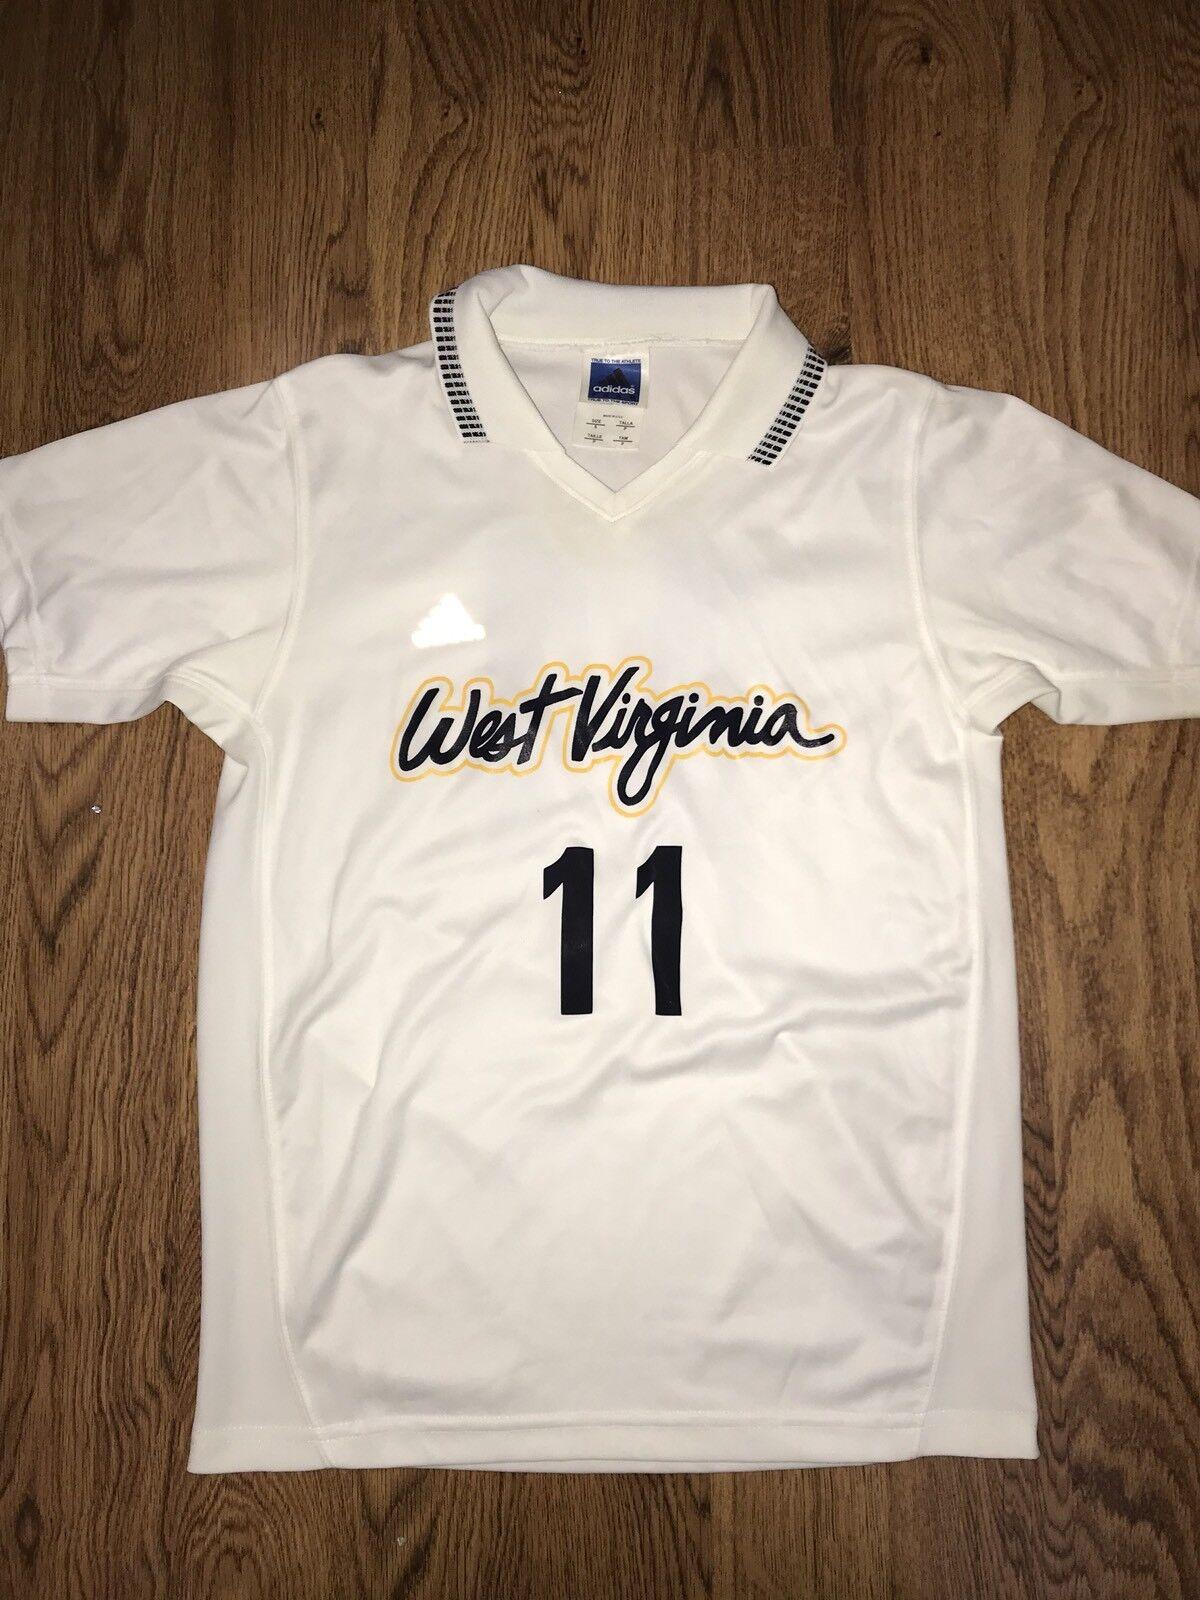 Adidas West Virginia Mountaineers # 11 Womens Soccer Worn Jersey * S *